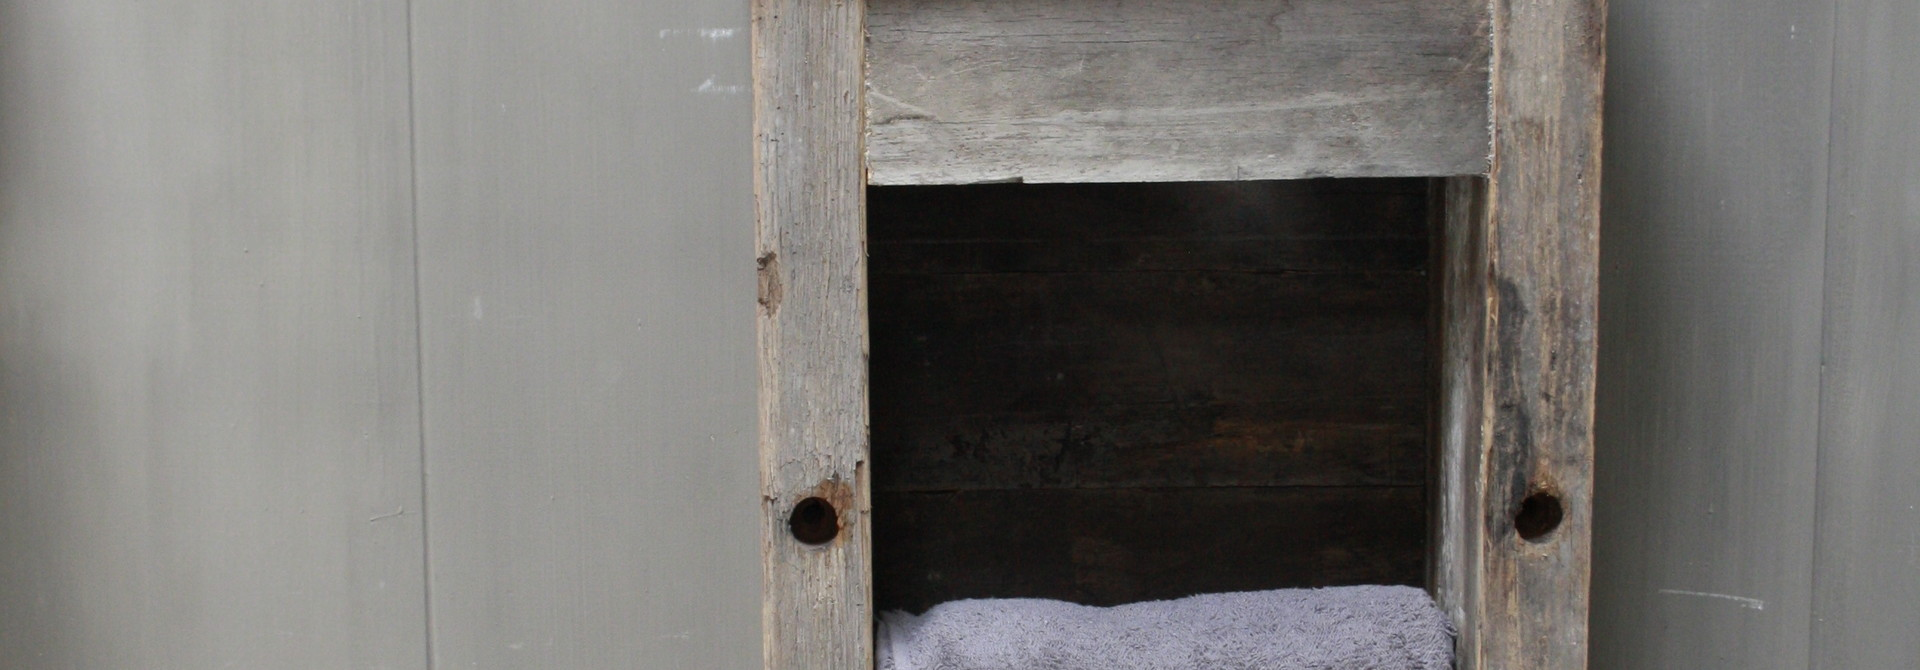 Toiletmeubel oud hout met betonbak  90 cm light grey